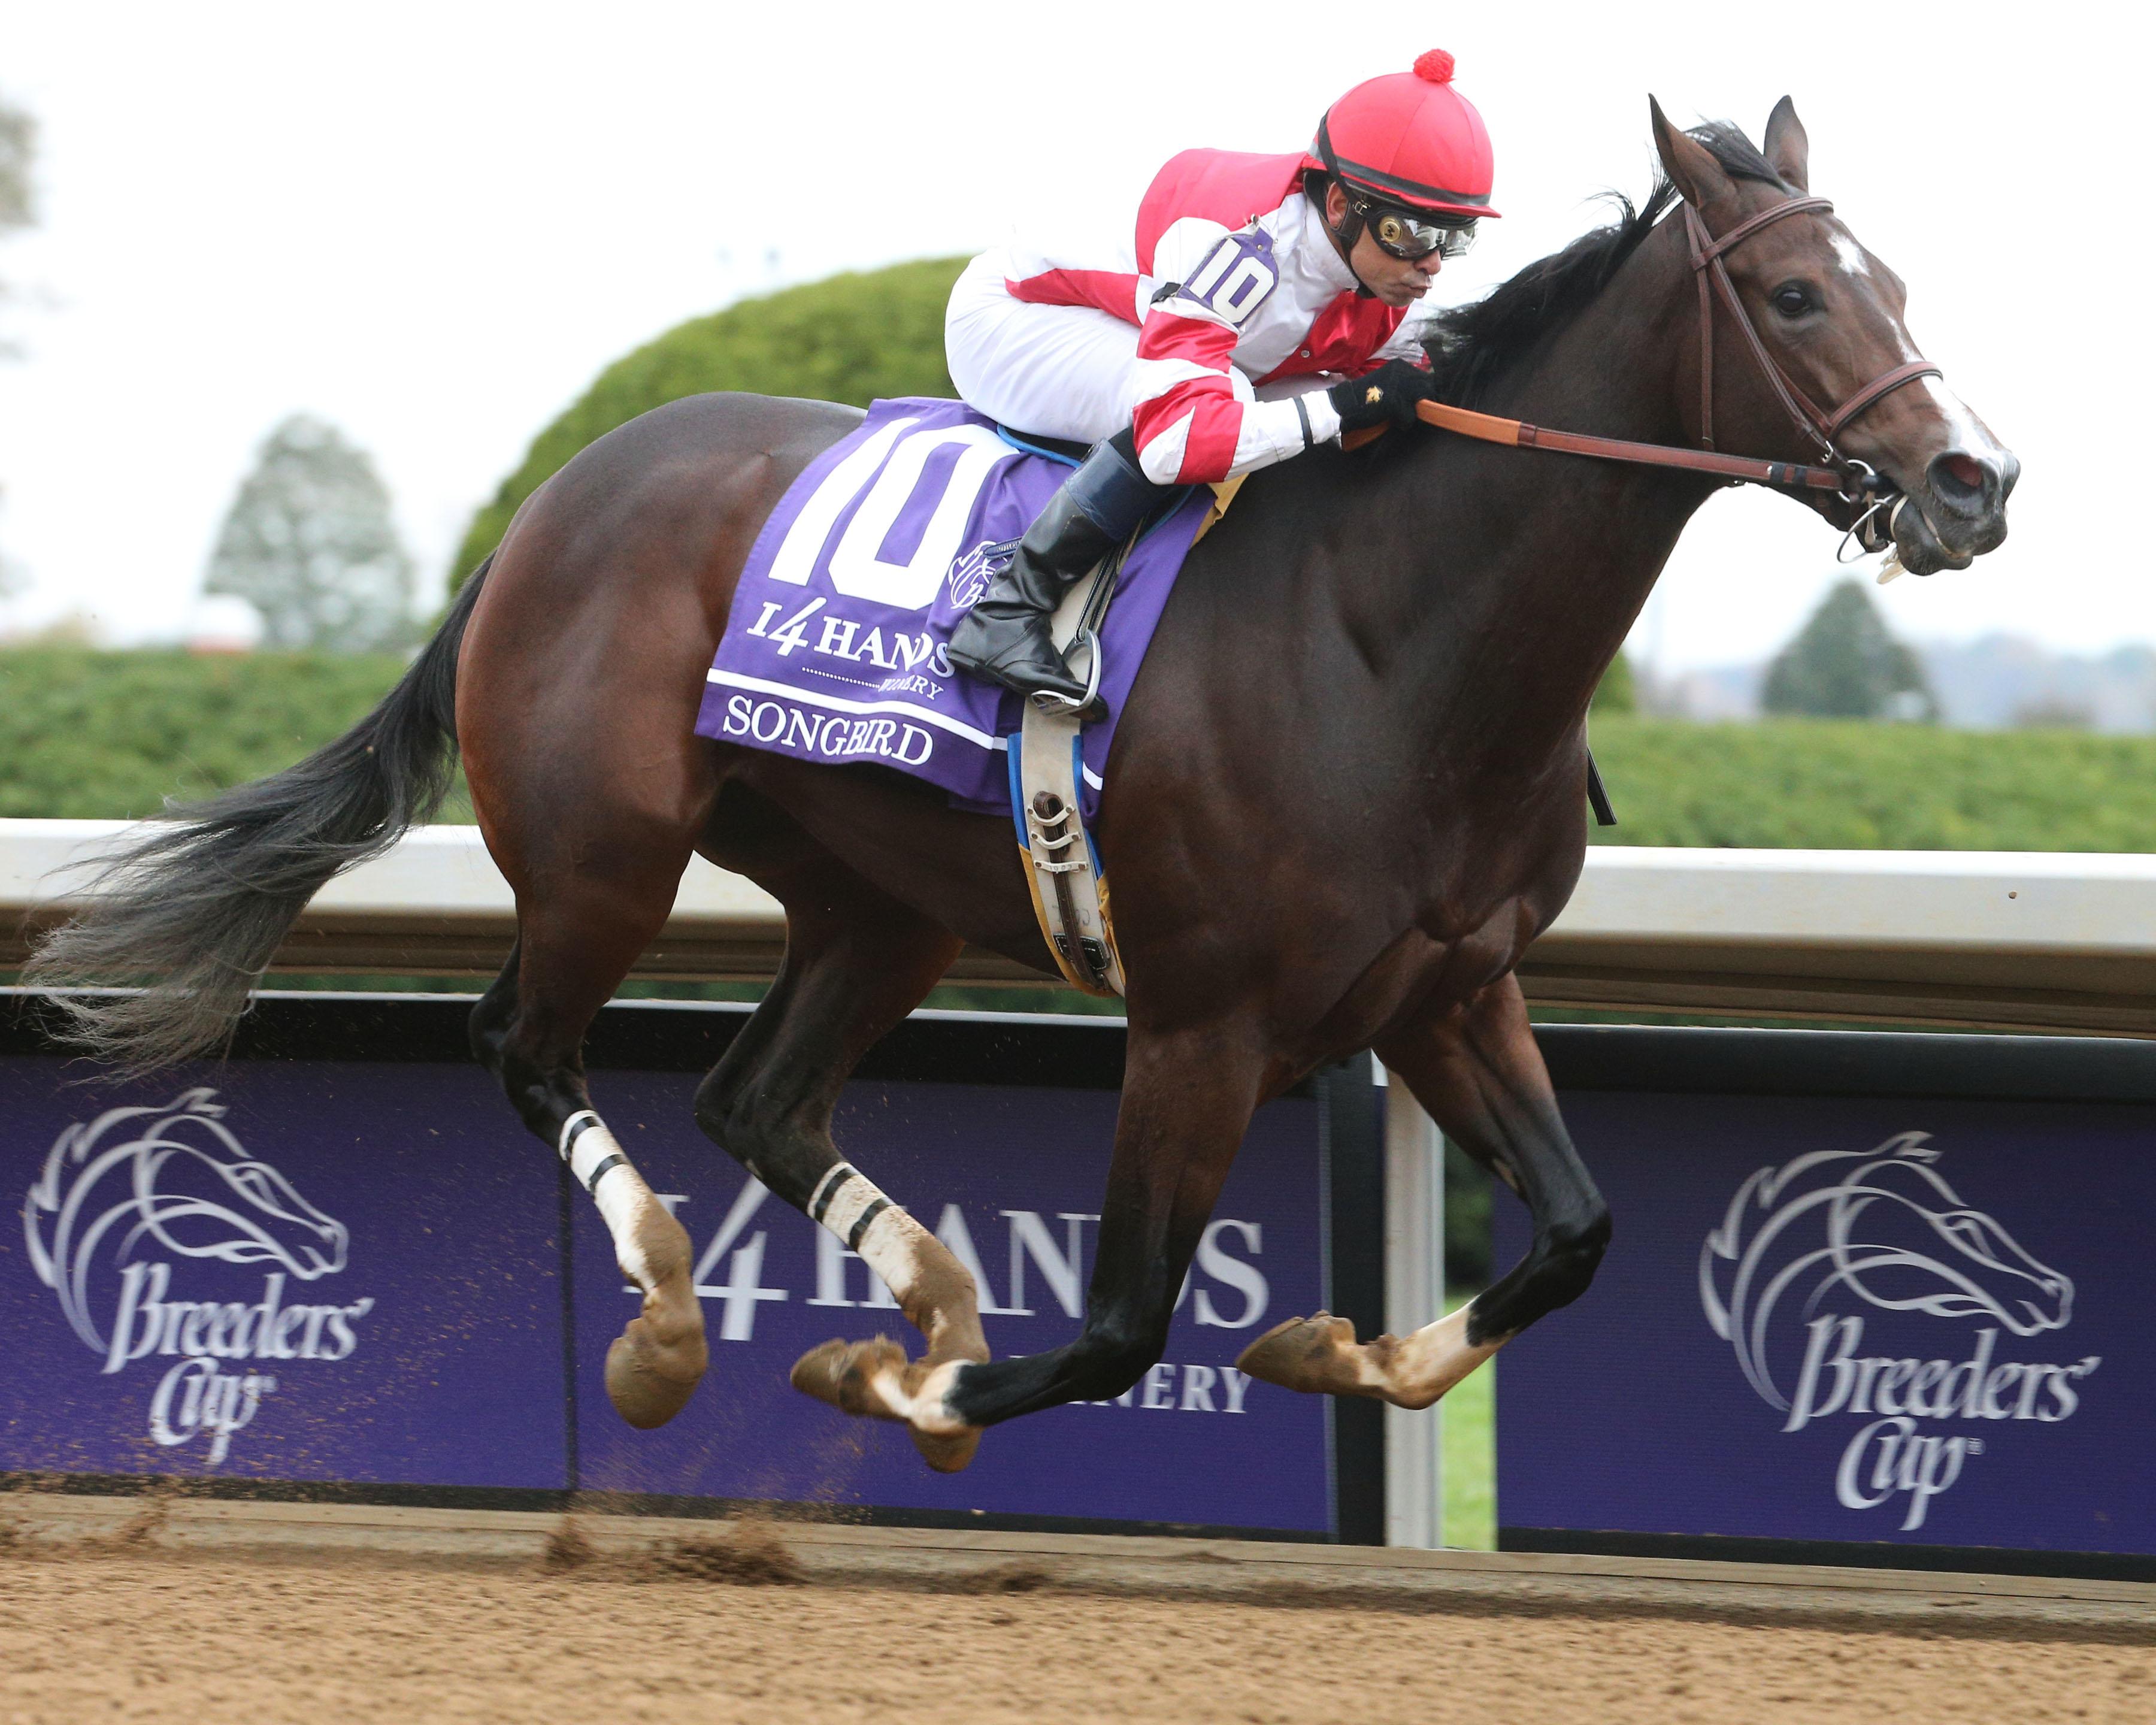 Songbird A Potential Wildcard For 2016 Kentucky Derby